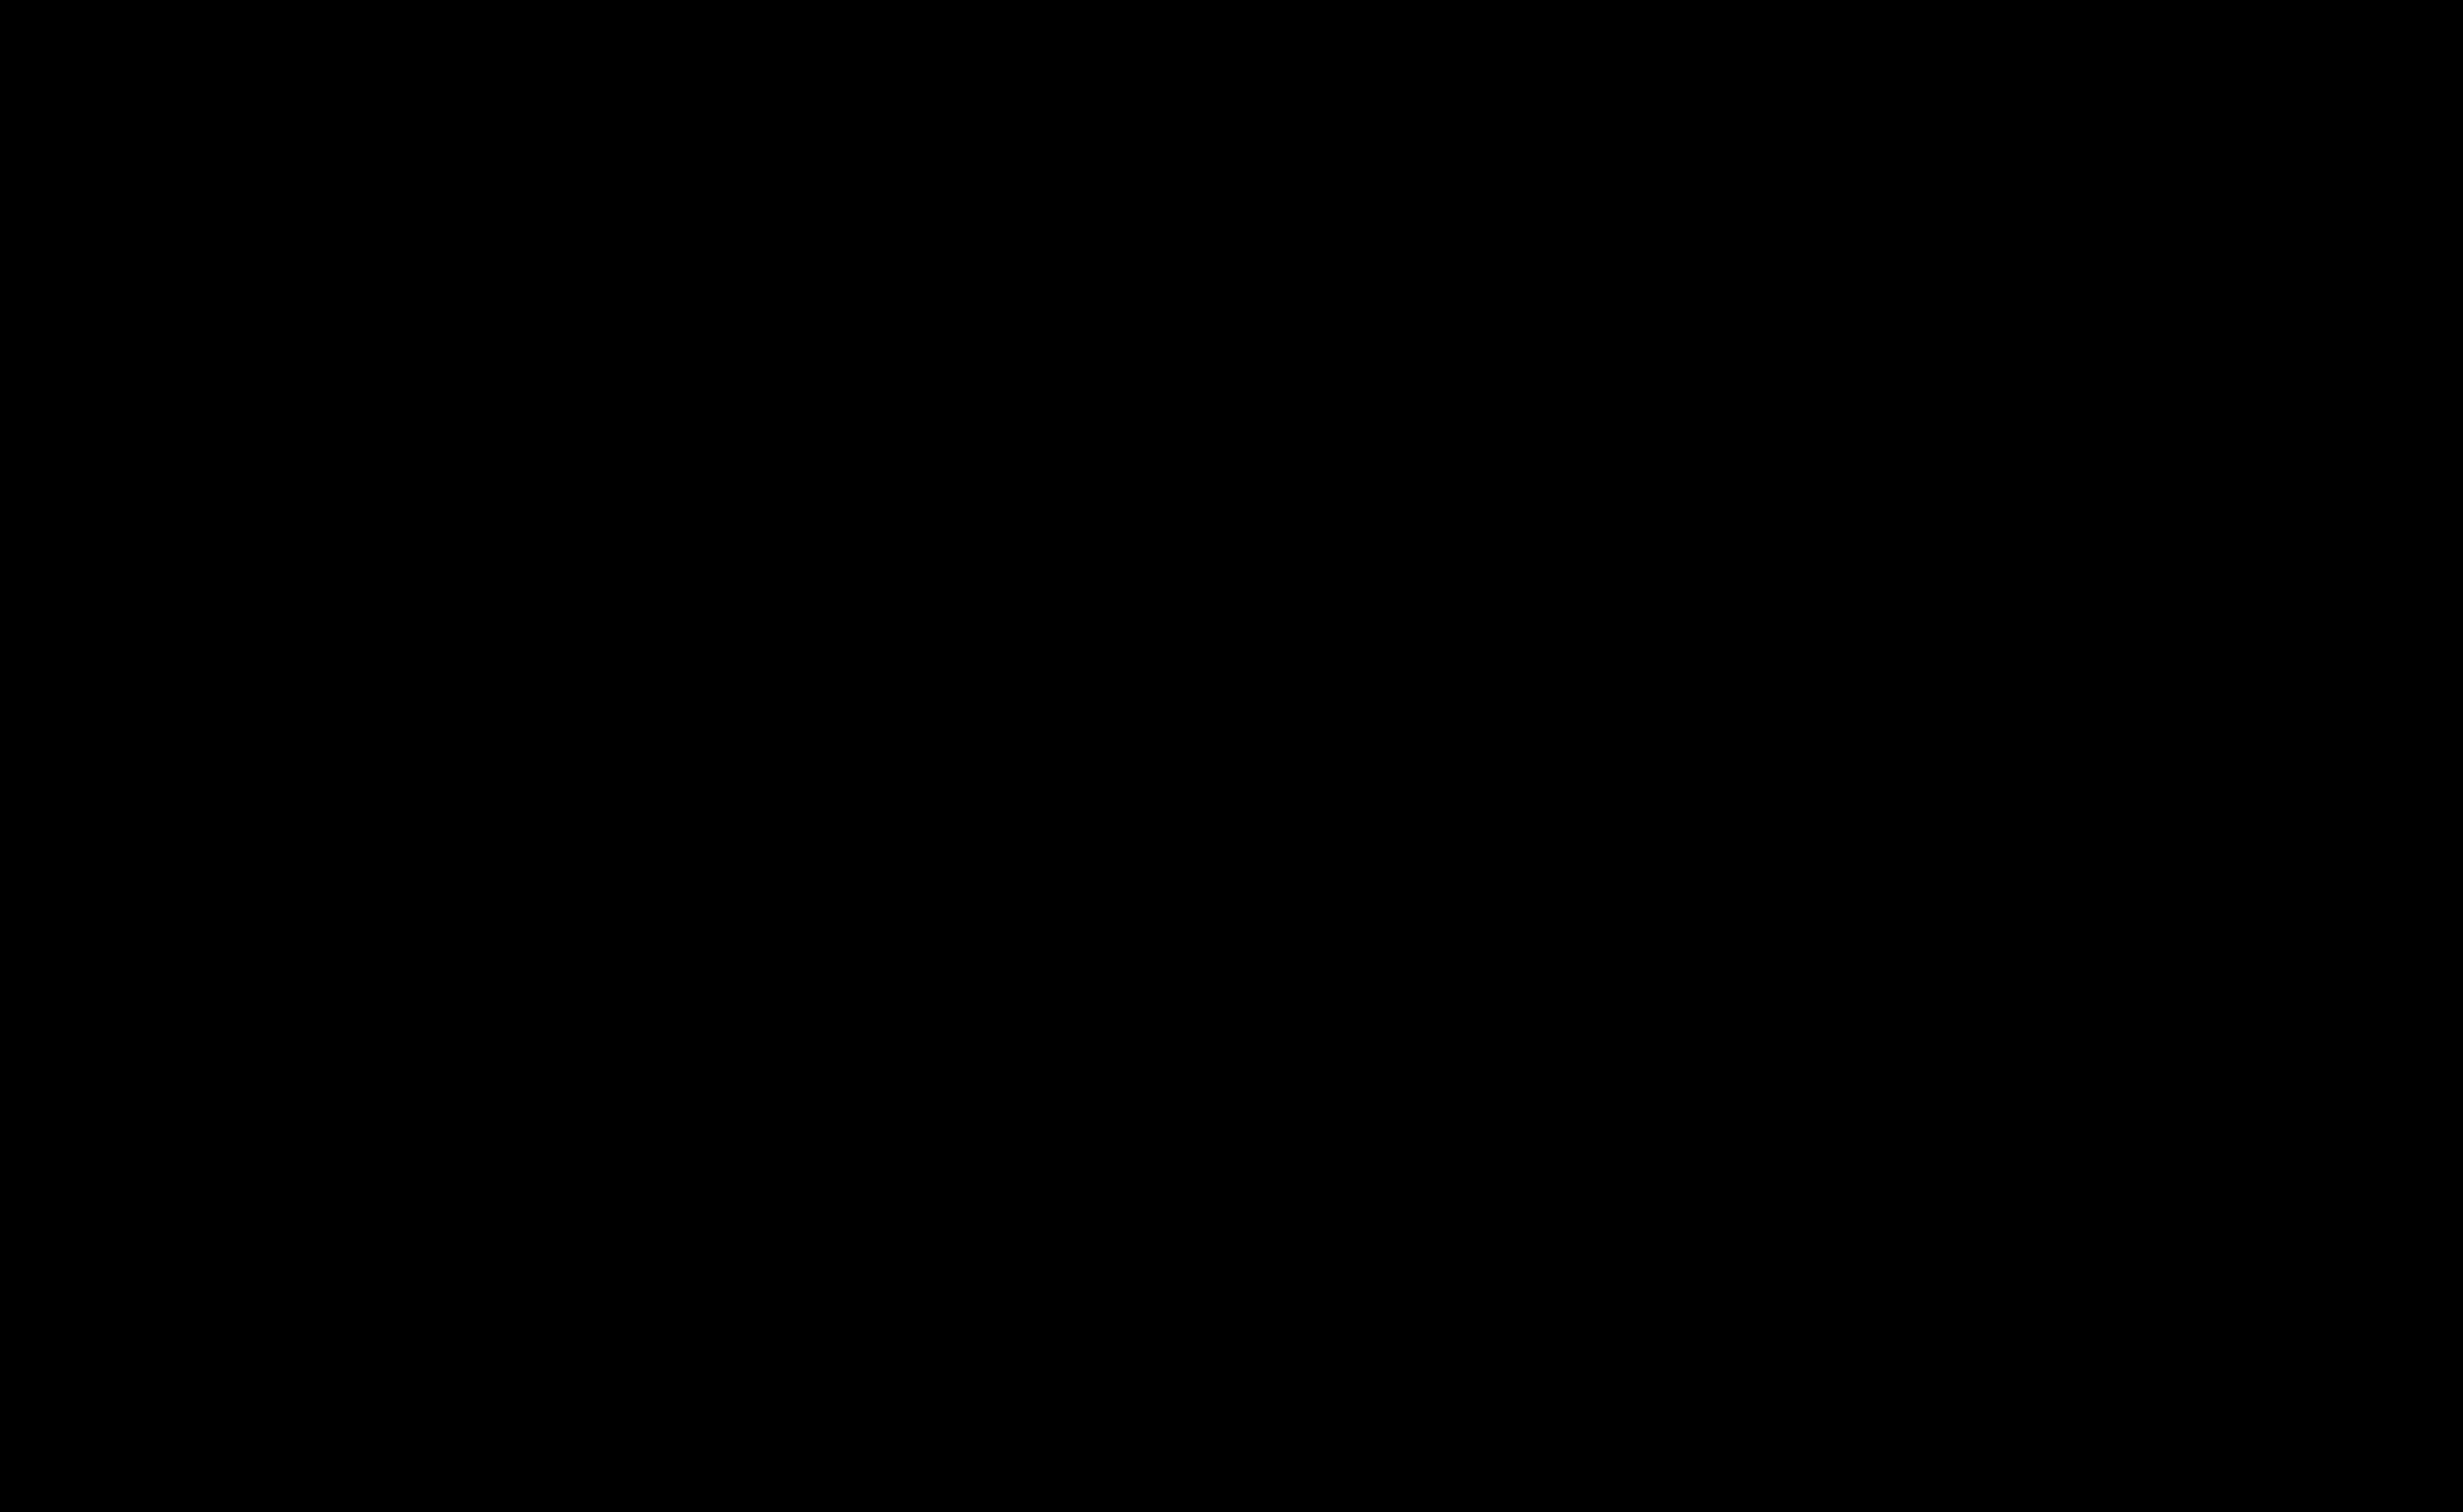 GHMP LOGO TEXT VARIANTA 2 CZ RGB.png